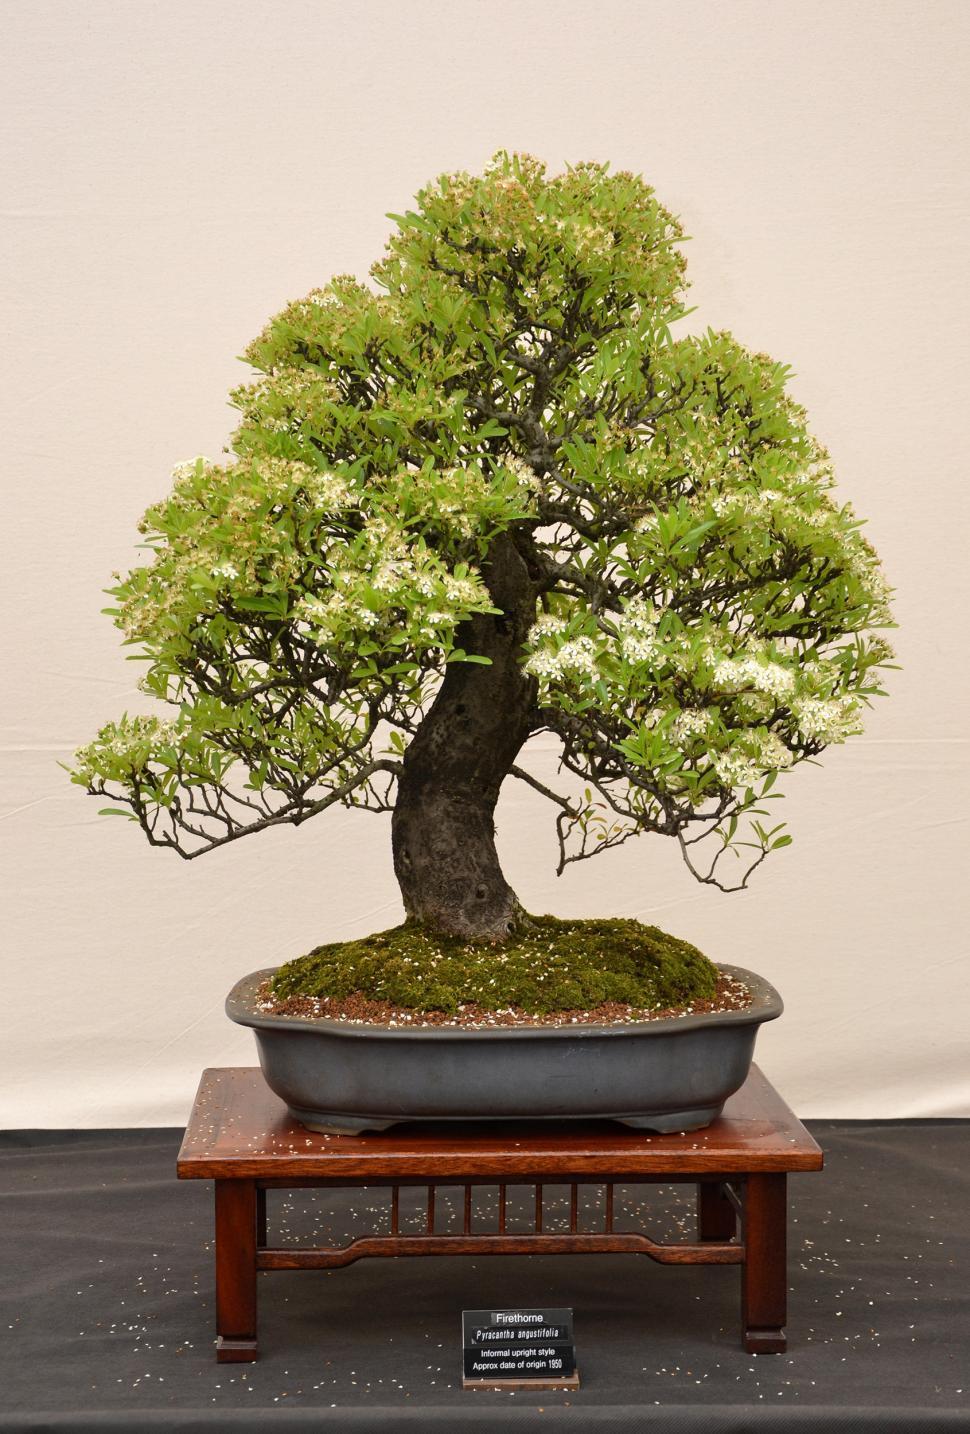 Download Free Stock HD Photo of Firethorn bonsai Online